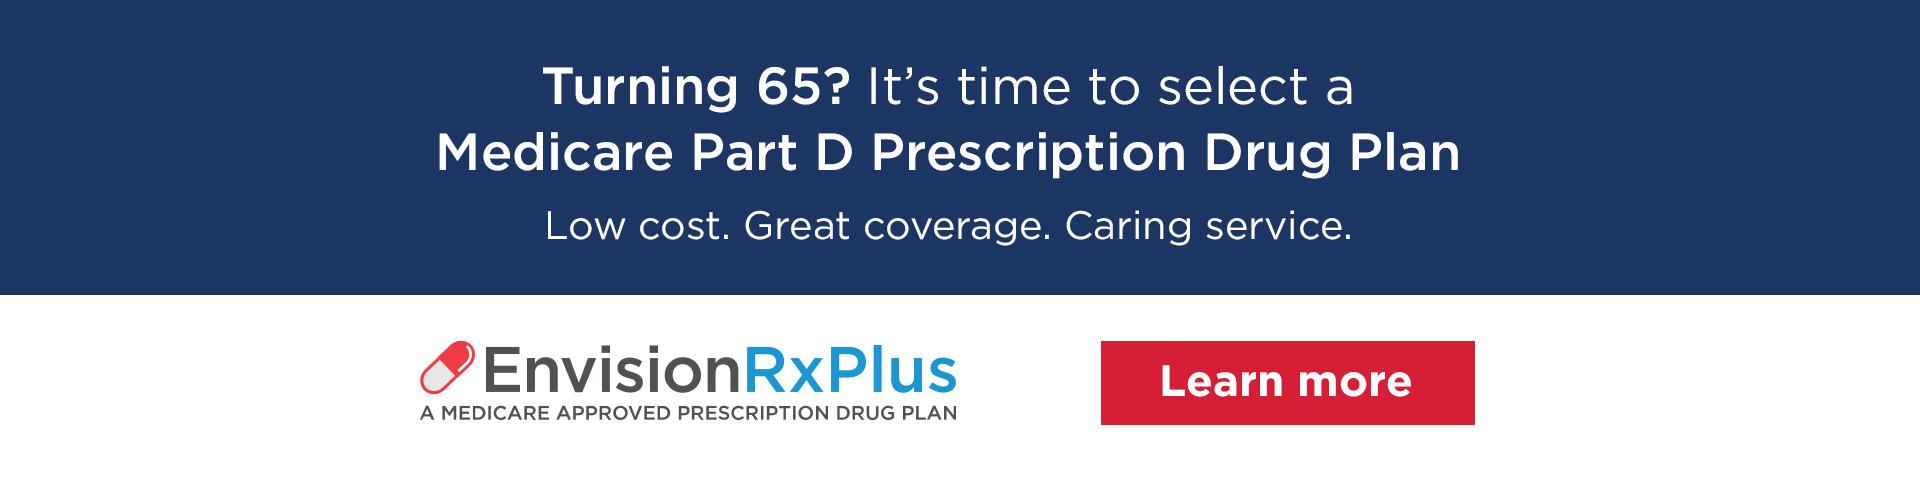 image of banner ad for EnvisionRxPlus